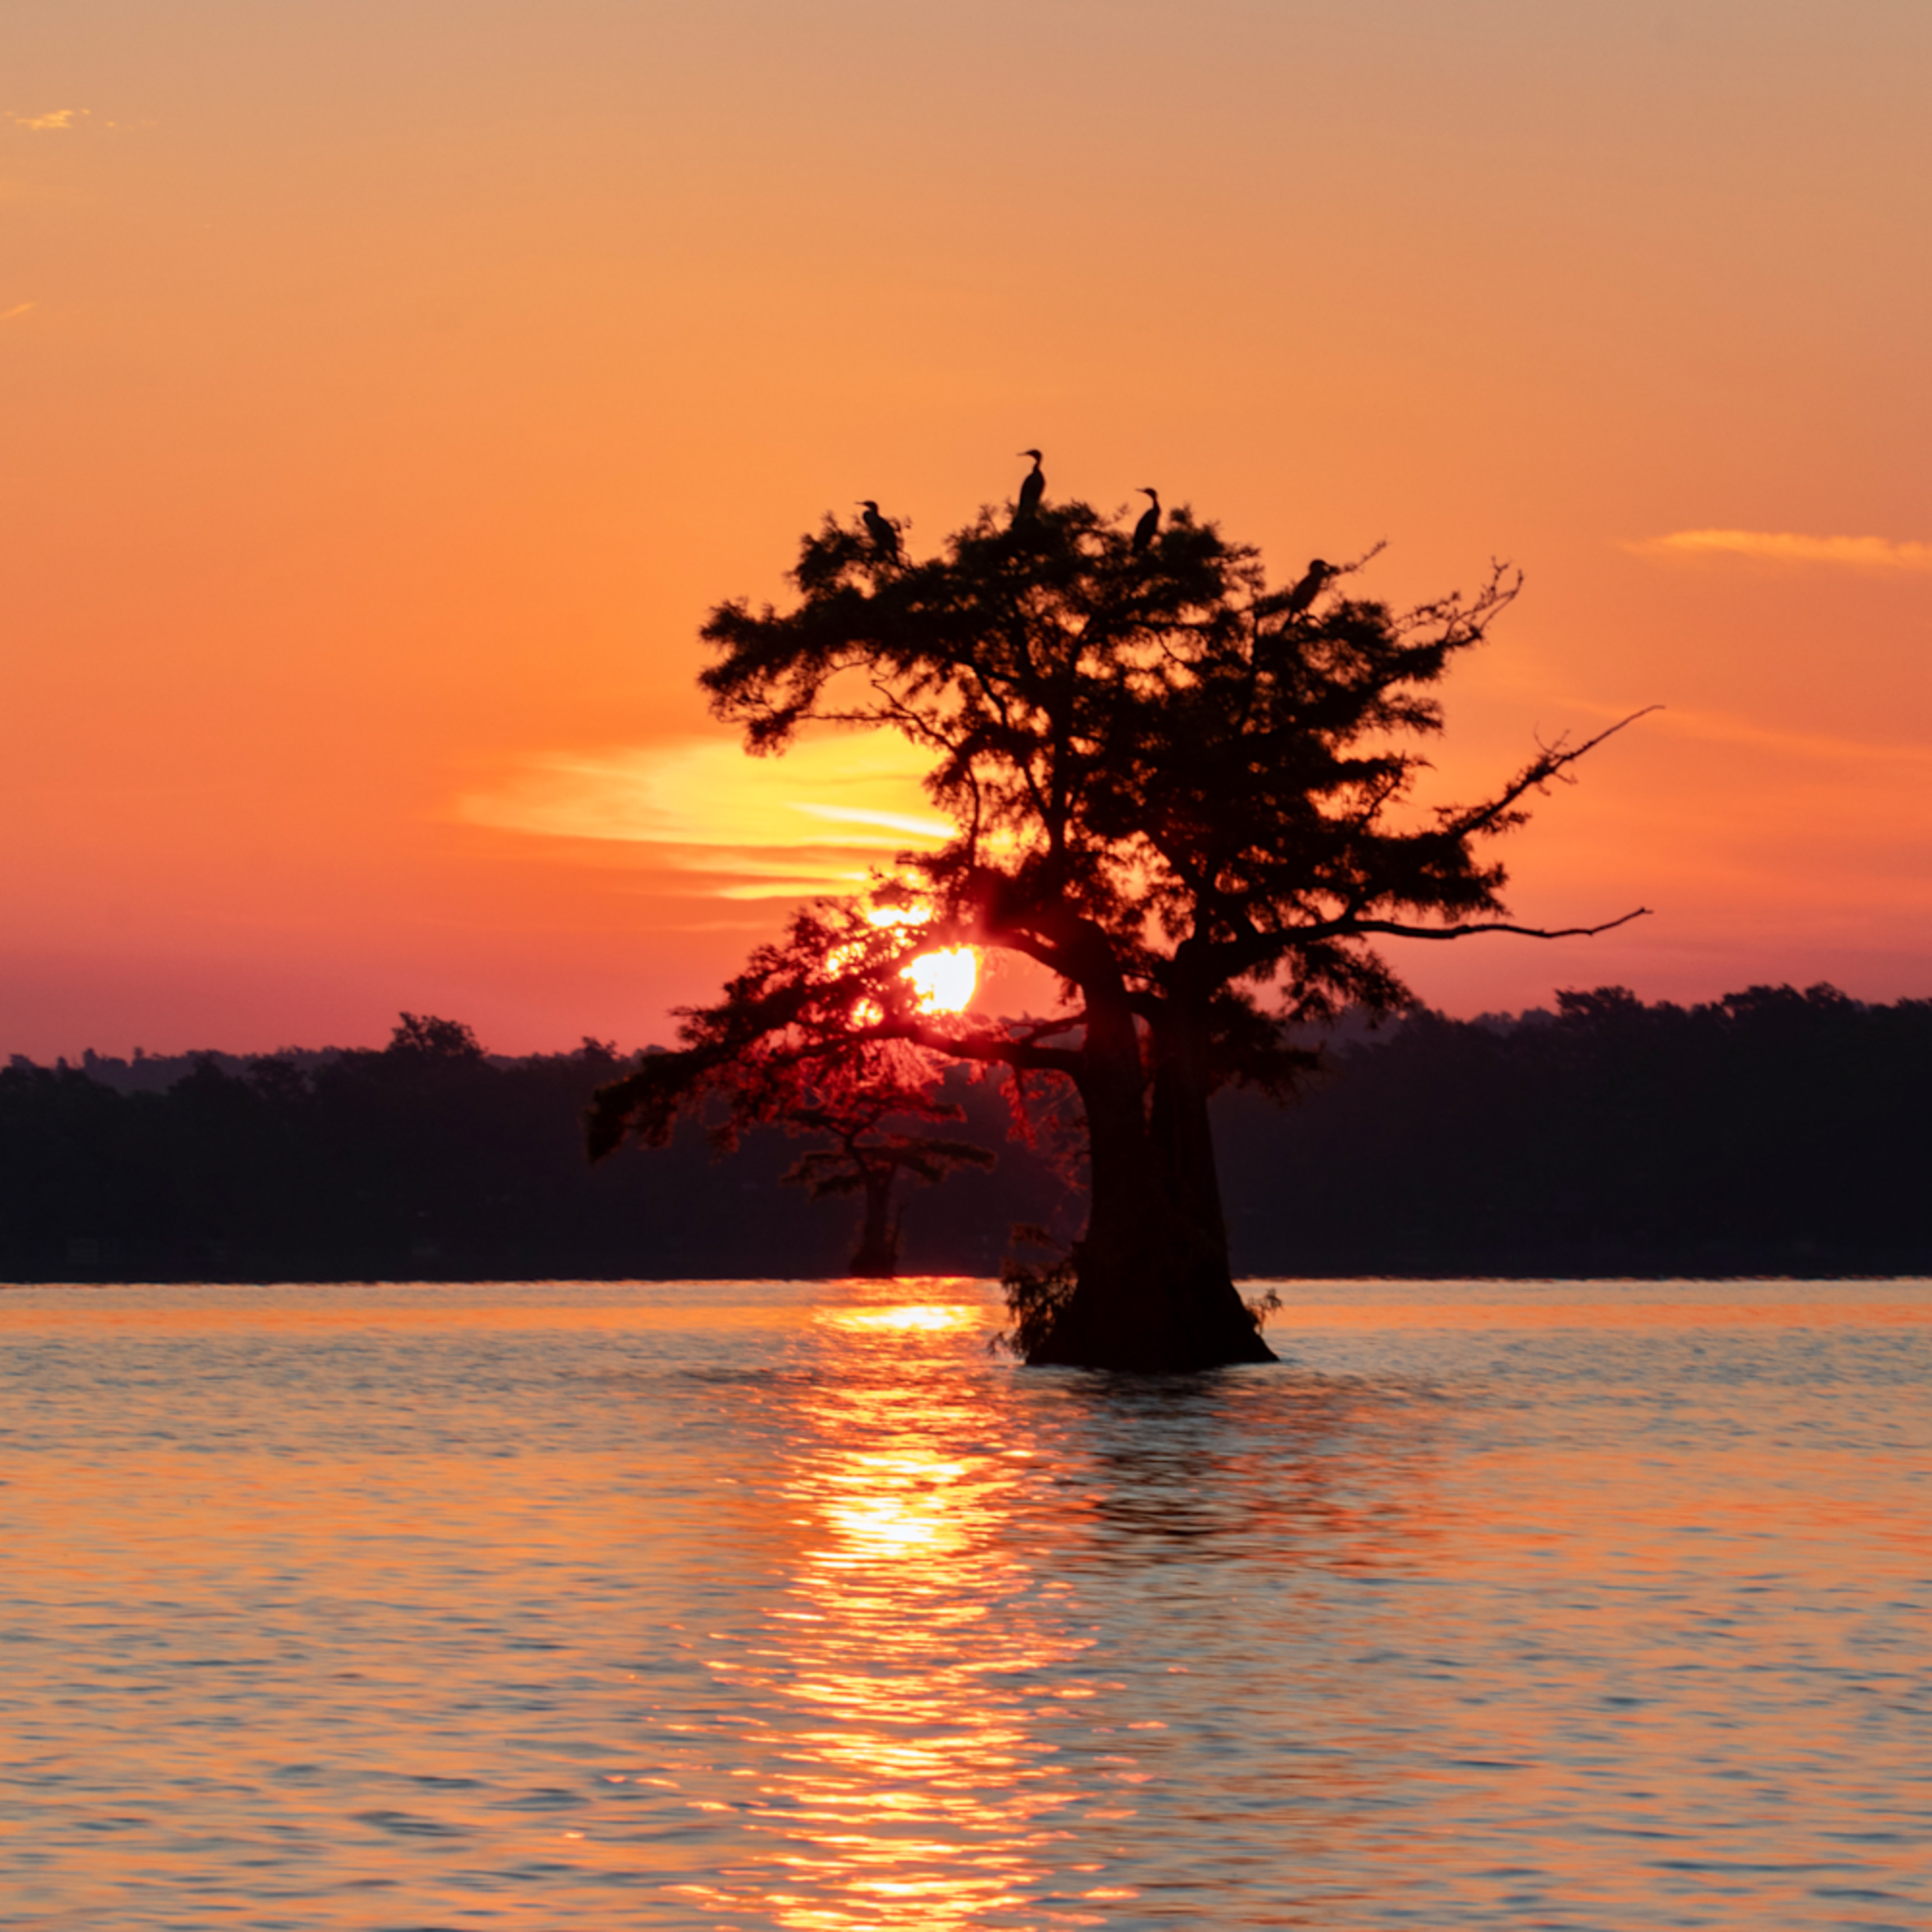 Sunsize cormorant tree  sun lower g  mg 8482 rlt20 yayq8s